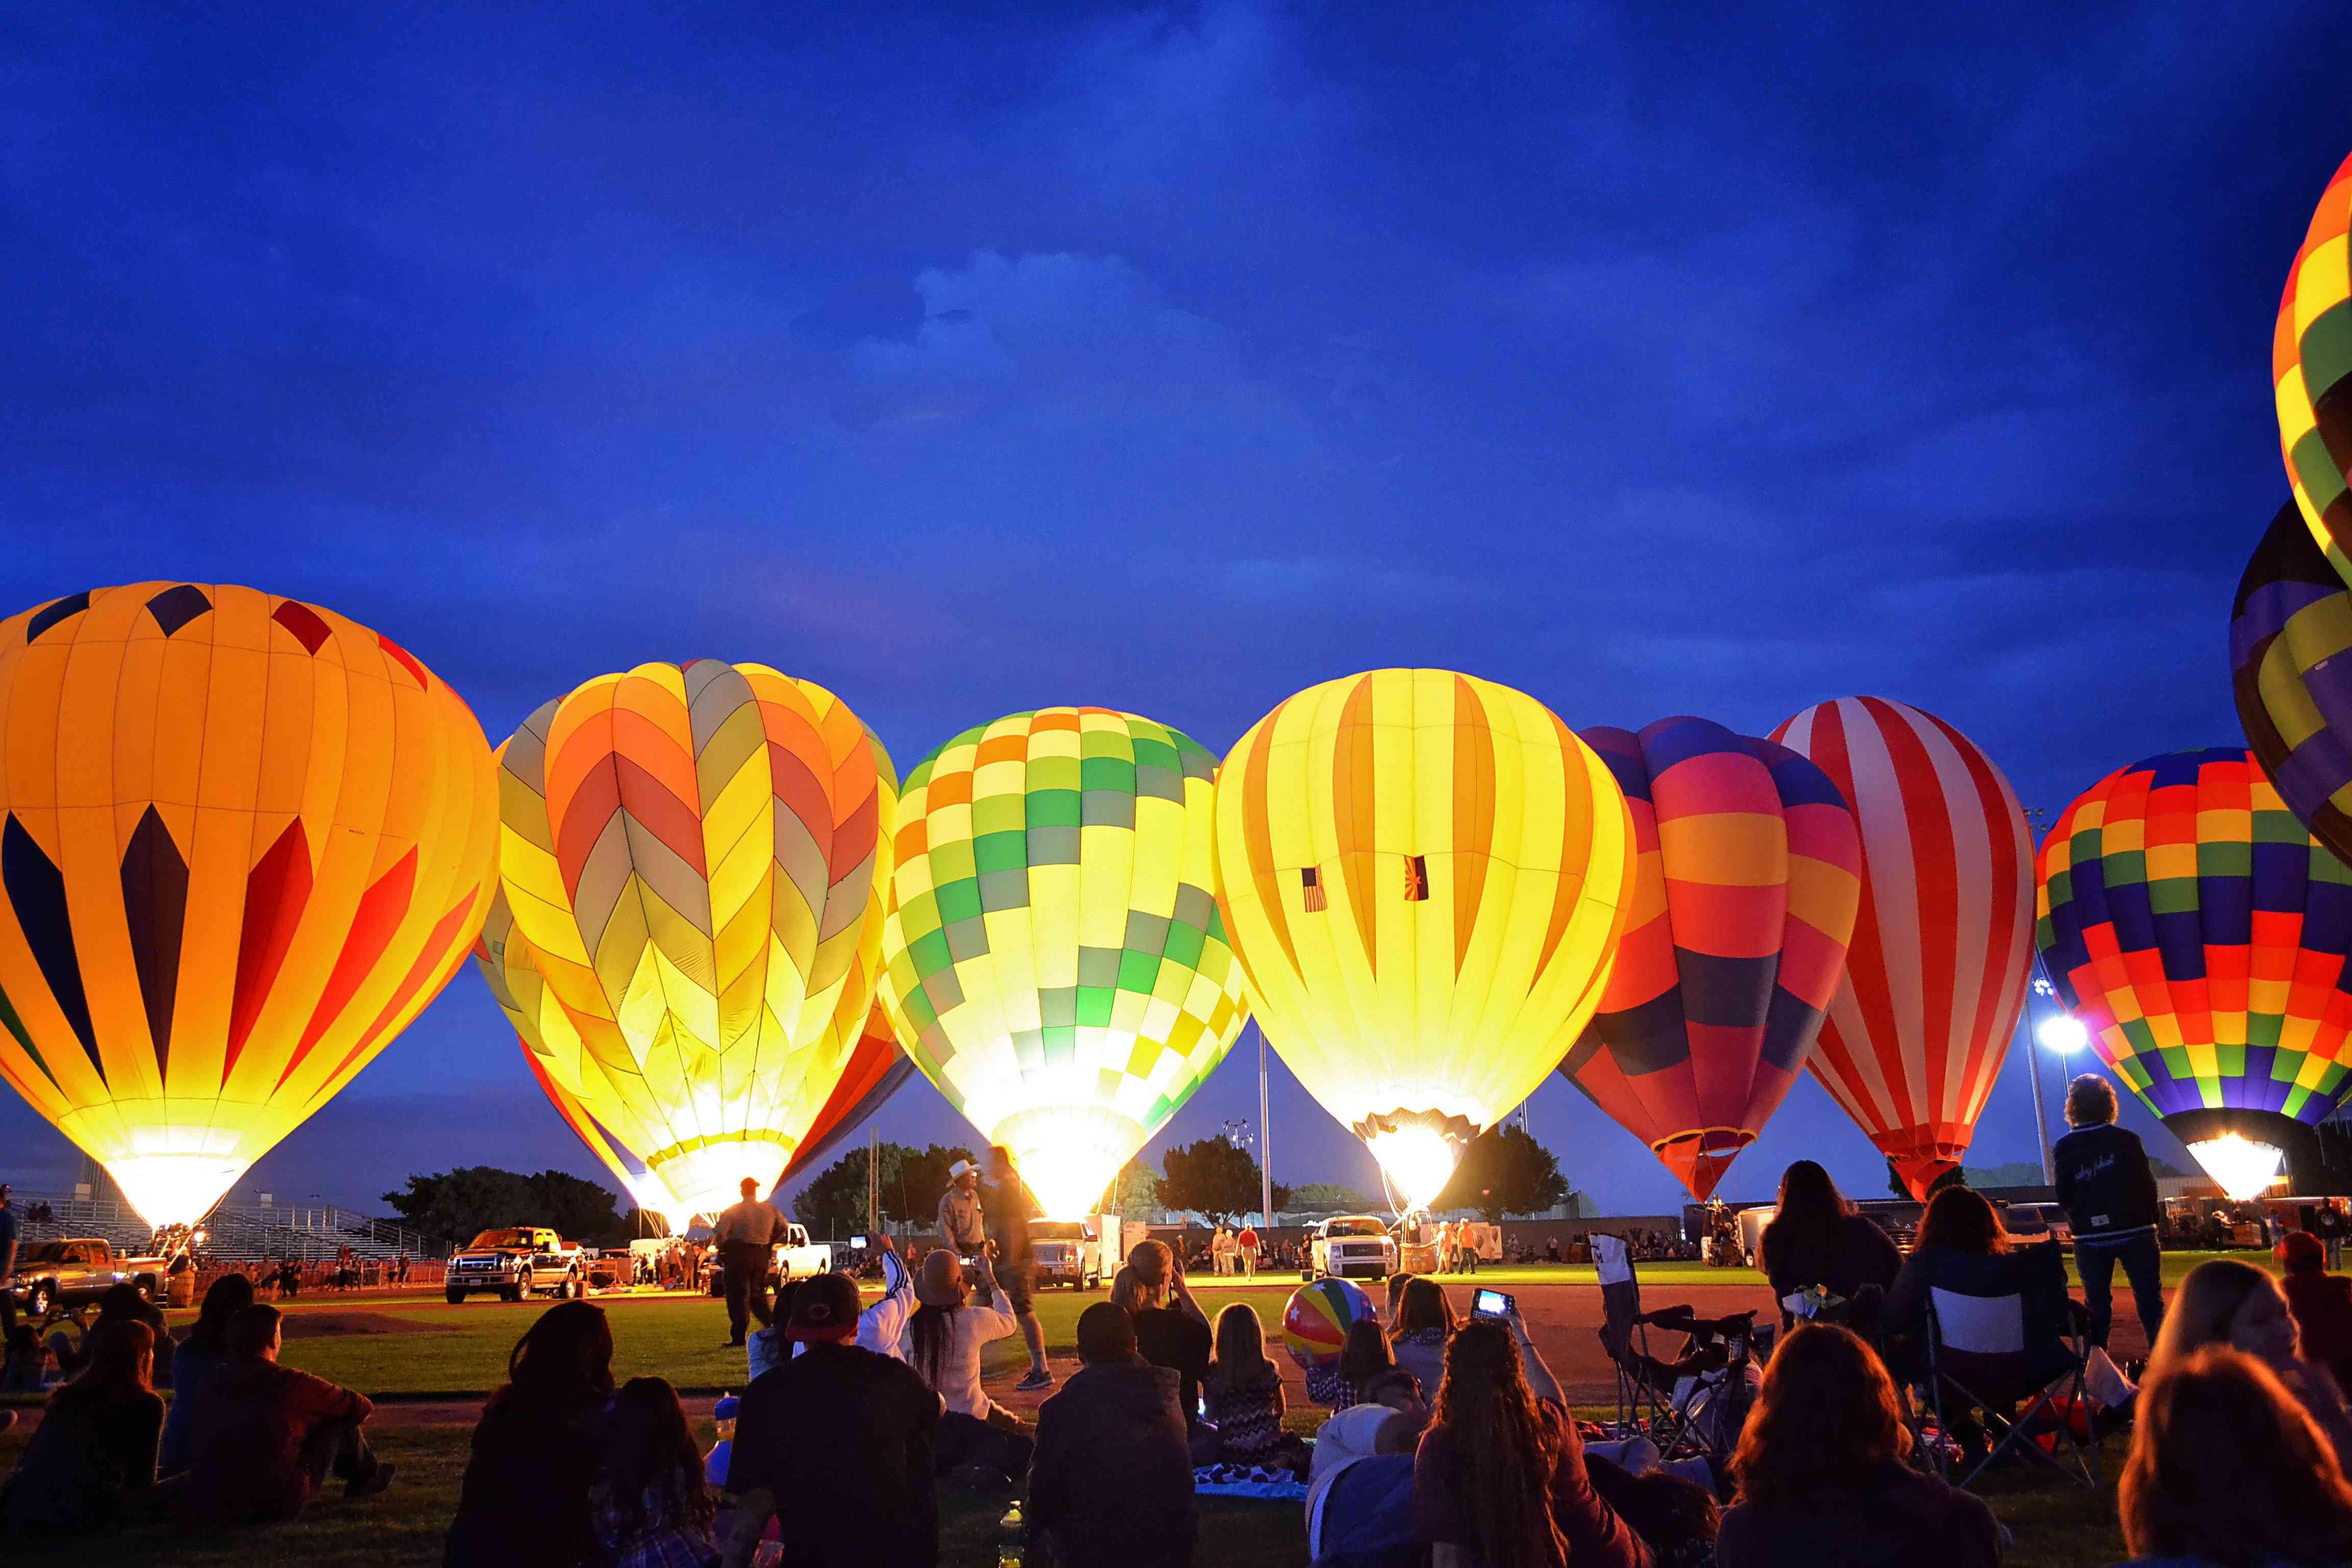 Evening Balloon Glow